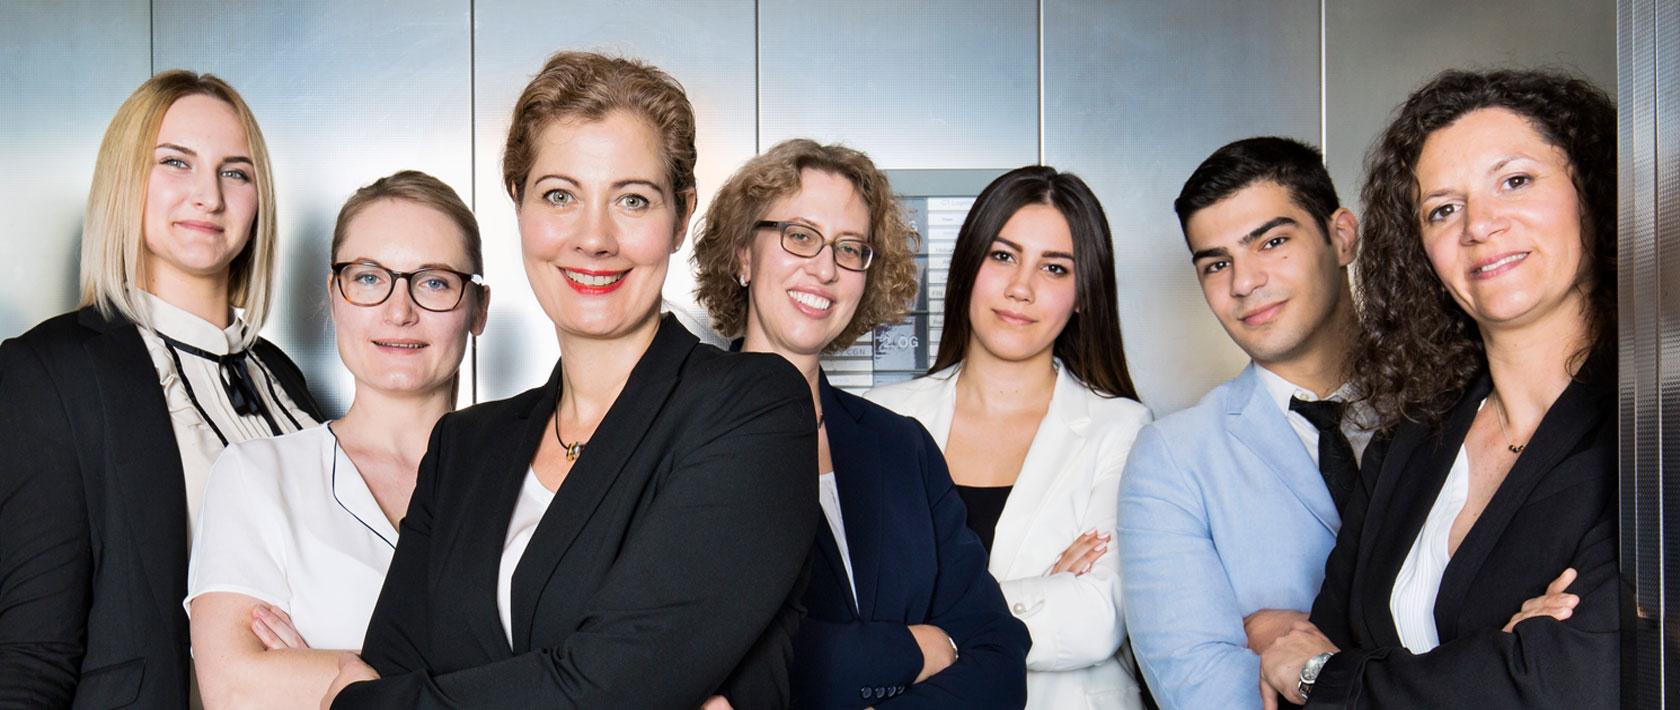 Team Steuerberatung Bergenrodt